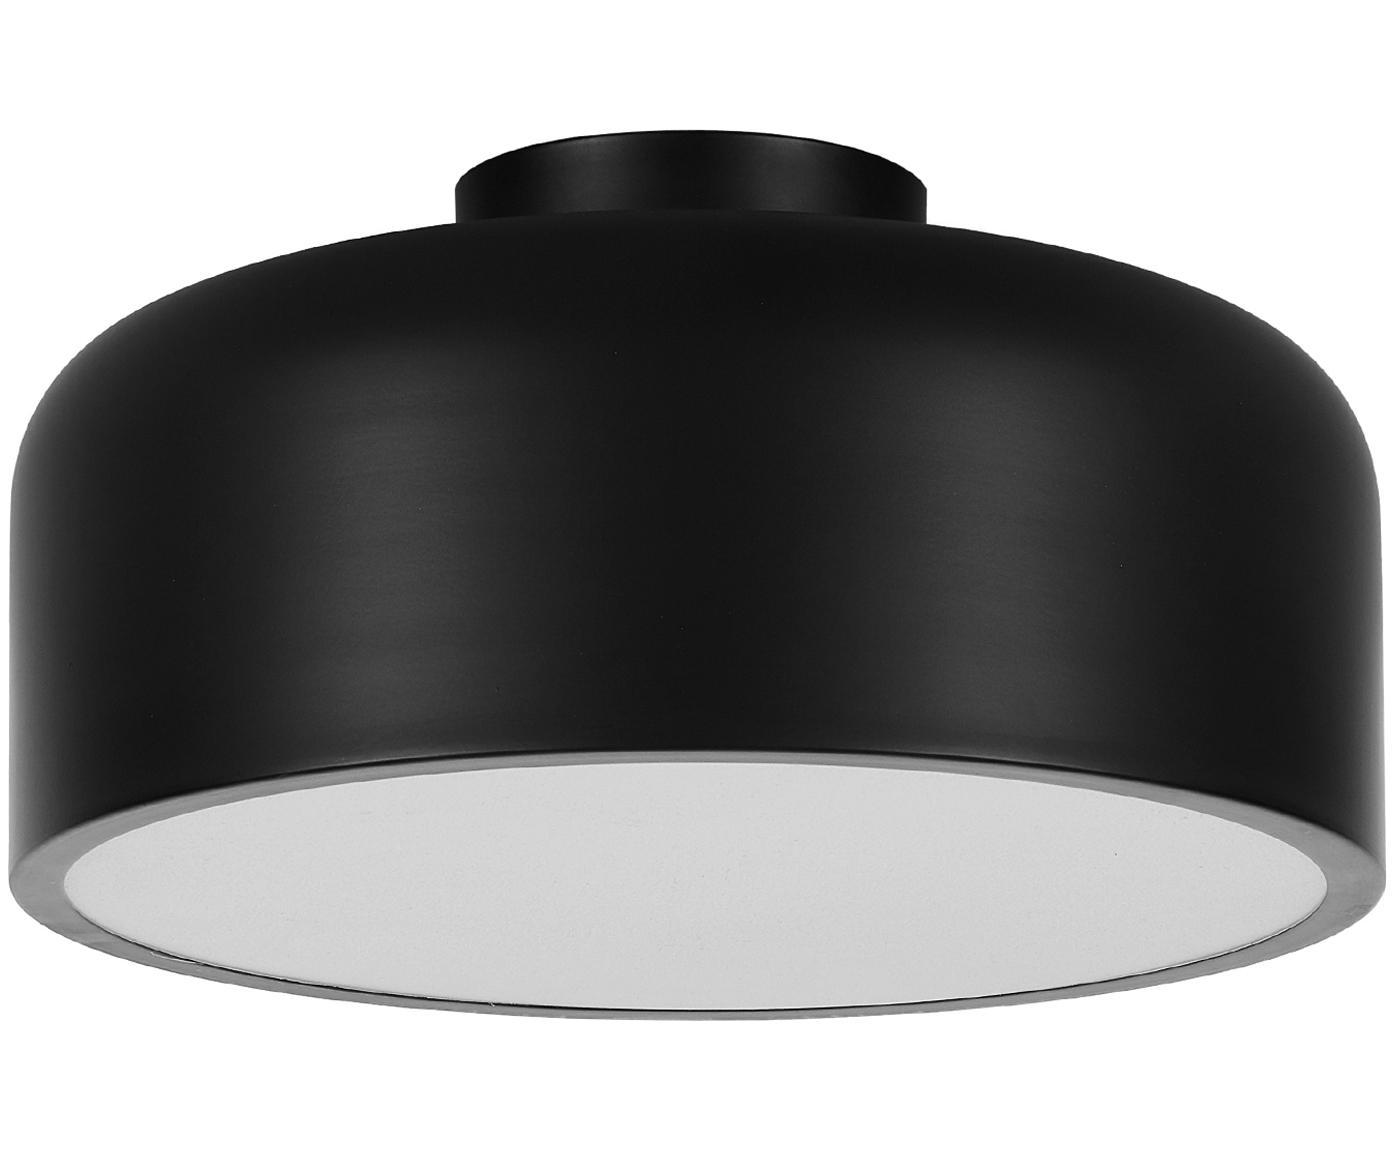 Plafón Ole, estilo escandinavo, Negro mate, Ø 35 x Al 18 cm